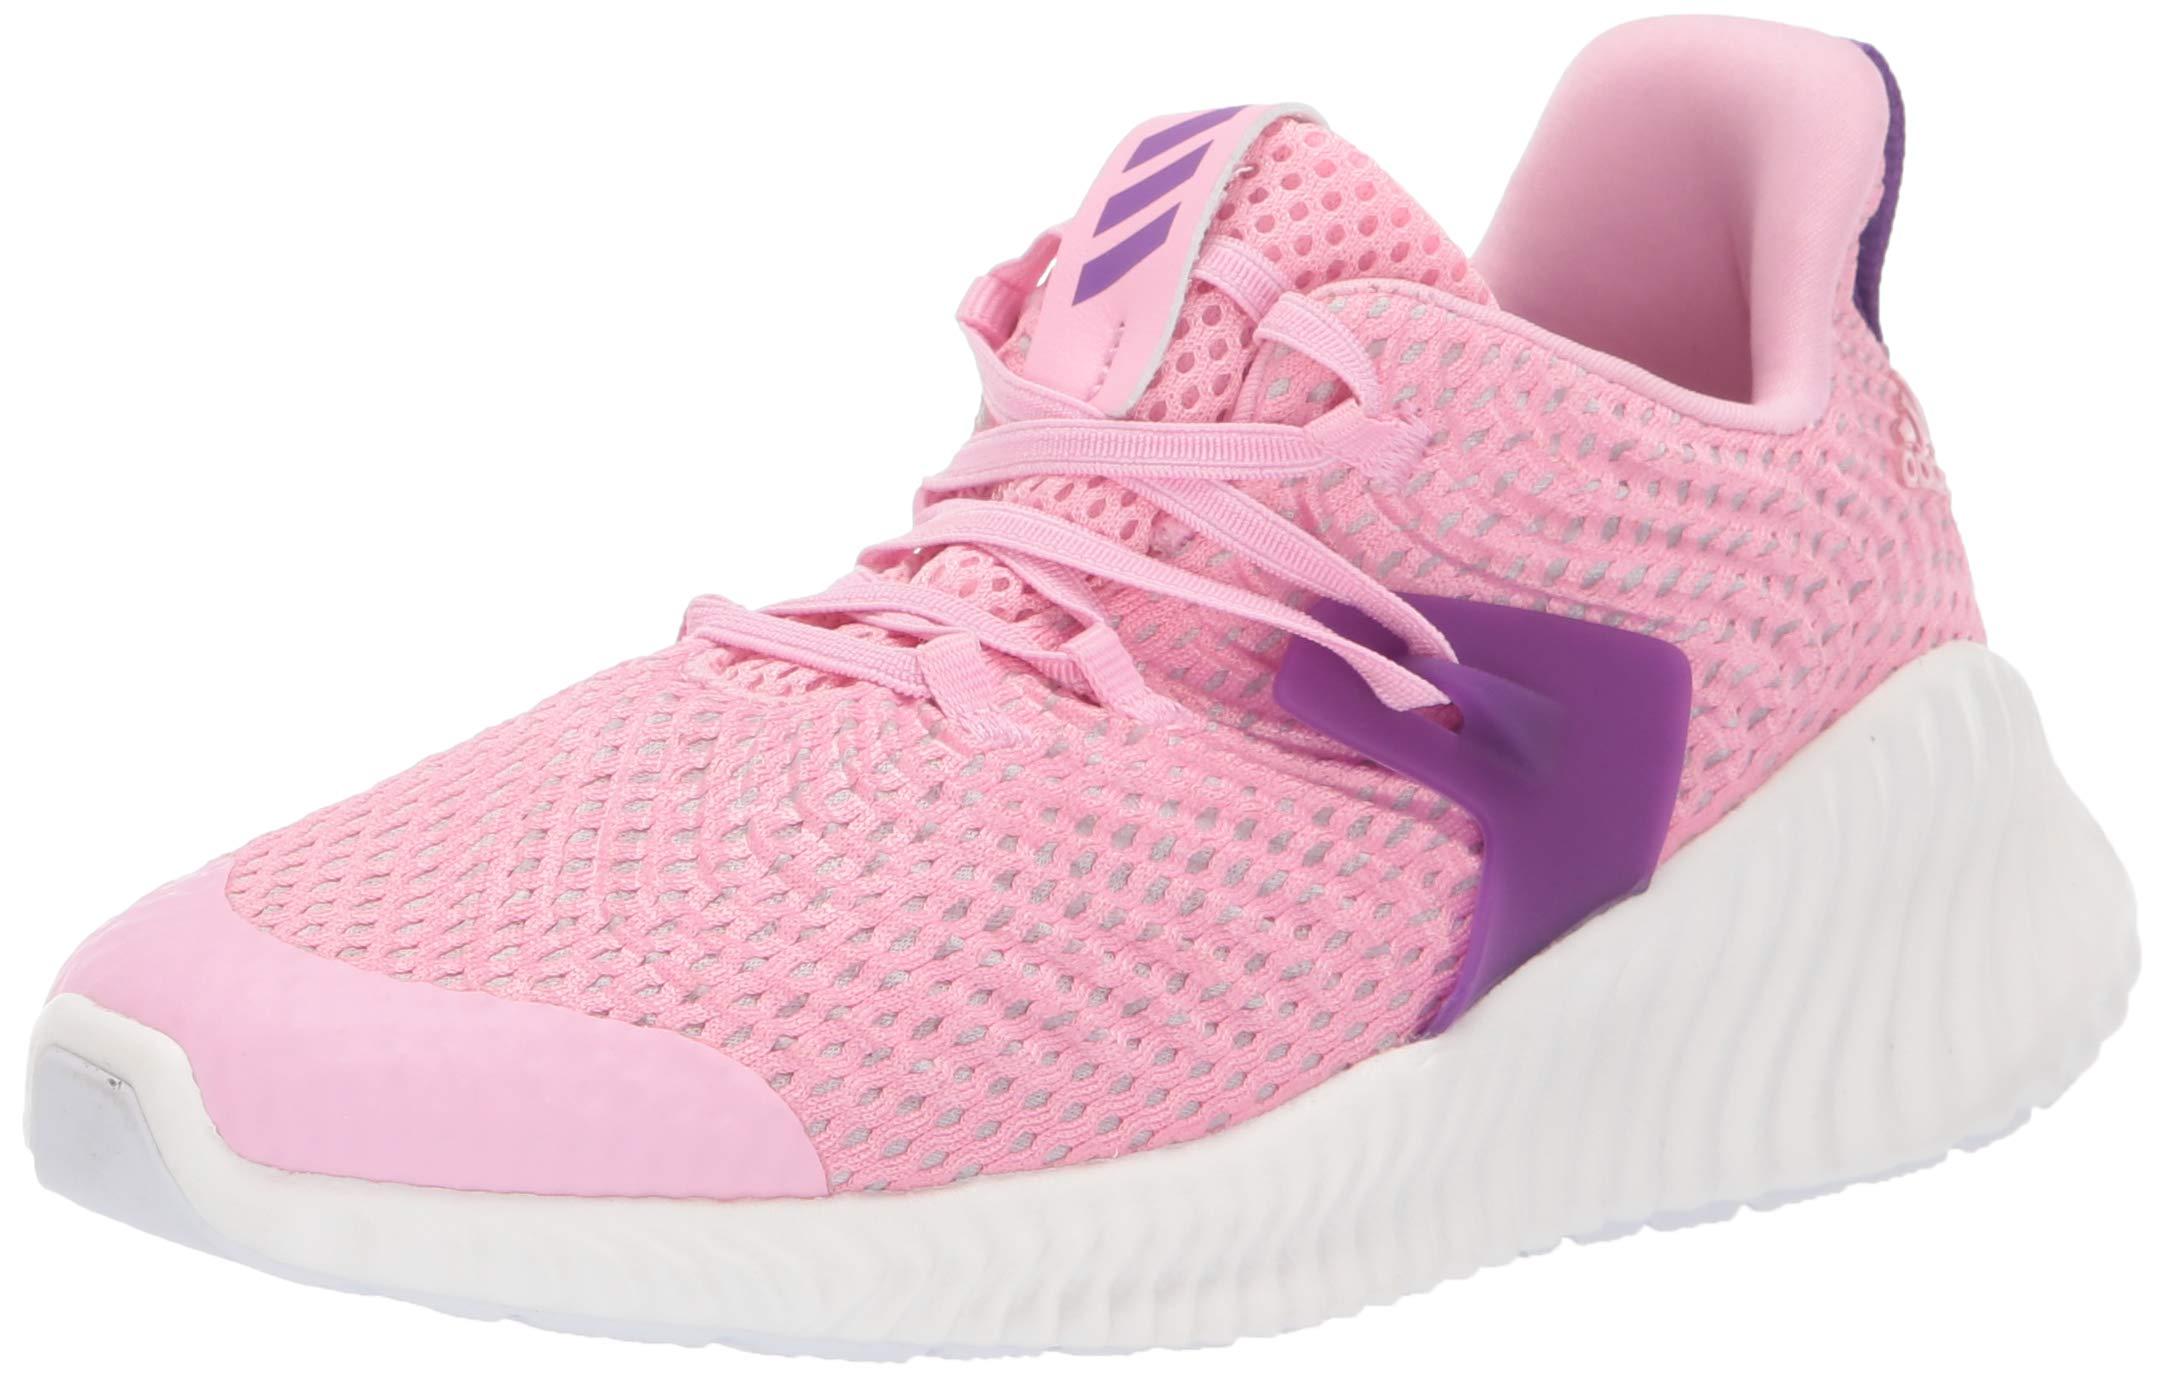 Adidas Kids Alphabounce Instinct, true pink/active purple/cloud white 2.5 M US Little Kid by adidas (Image #1)